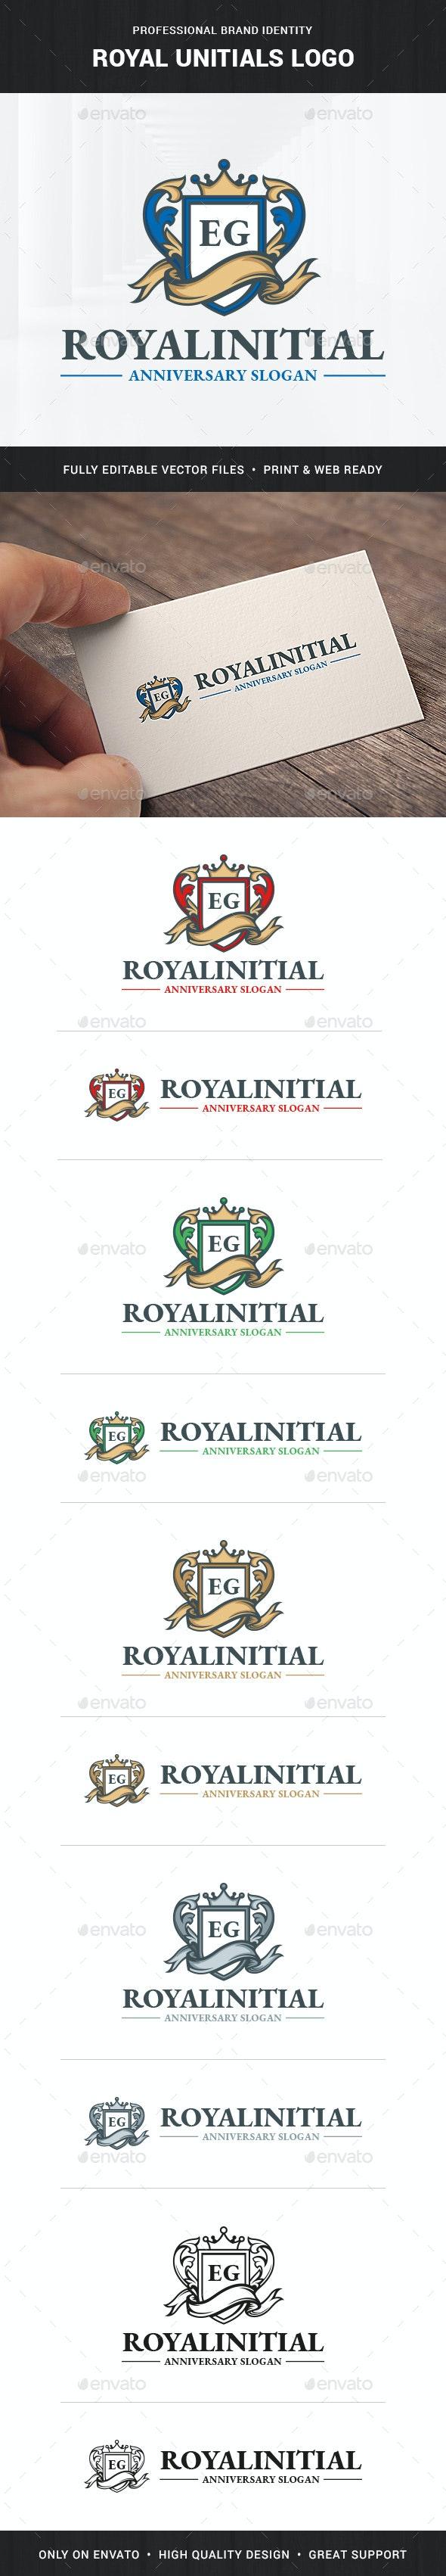 Royal Initials Logo Template